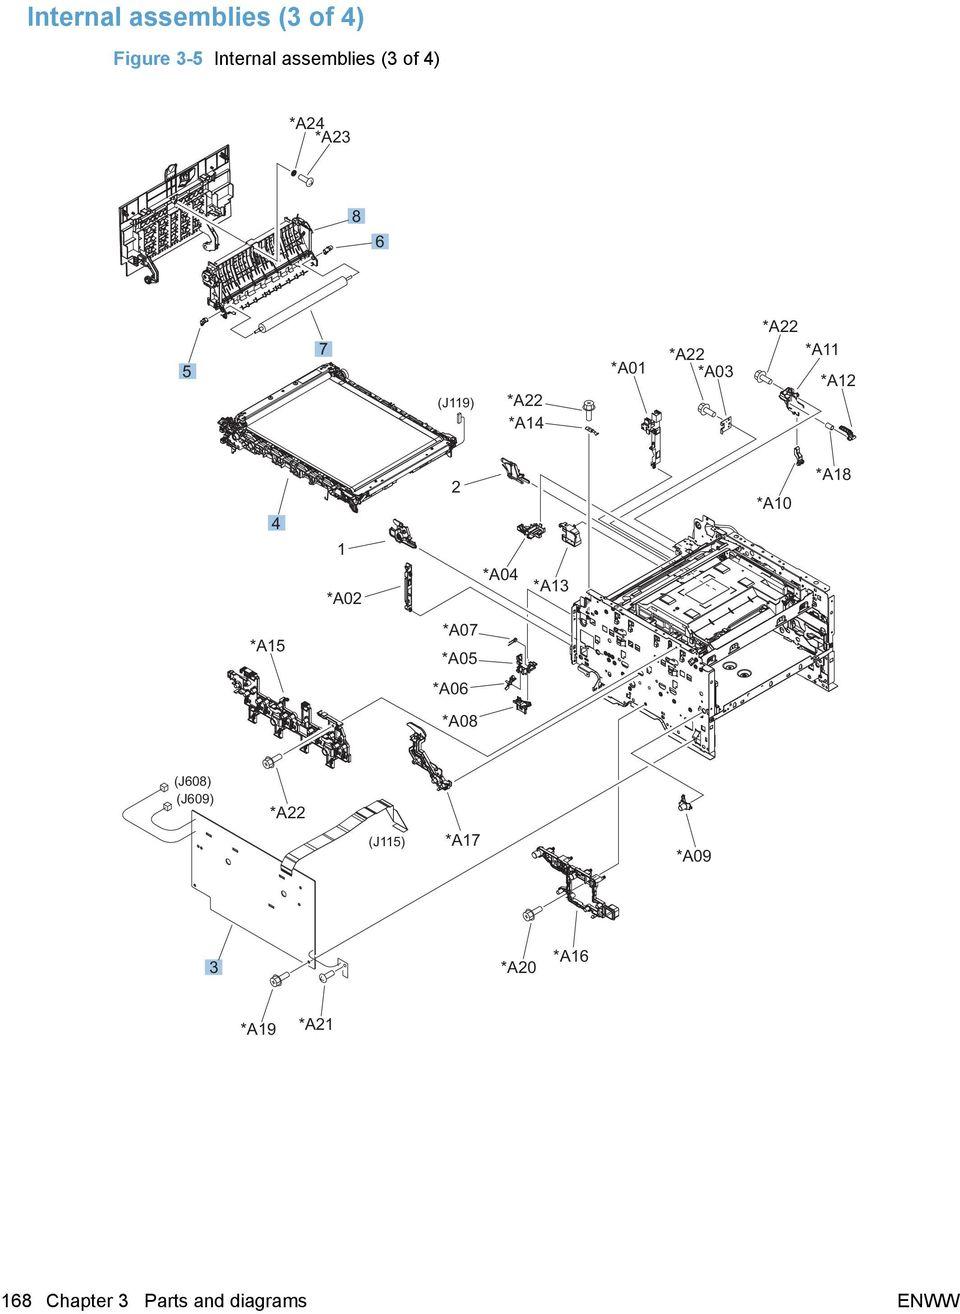 Hp Color Laserjet 2600n Parts Diagram. Top Cover Remove